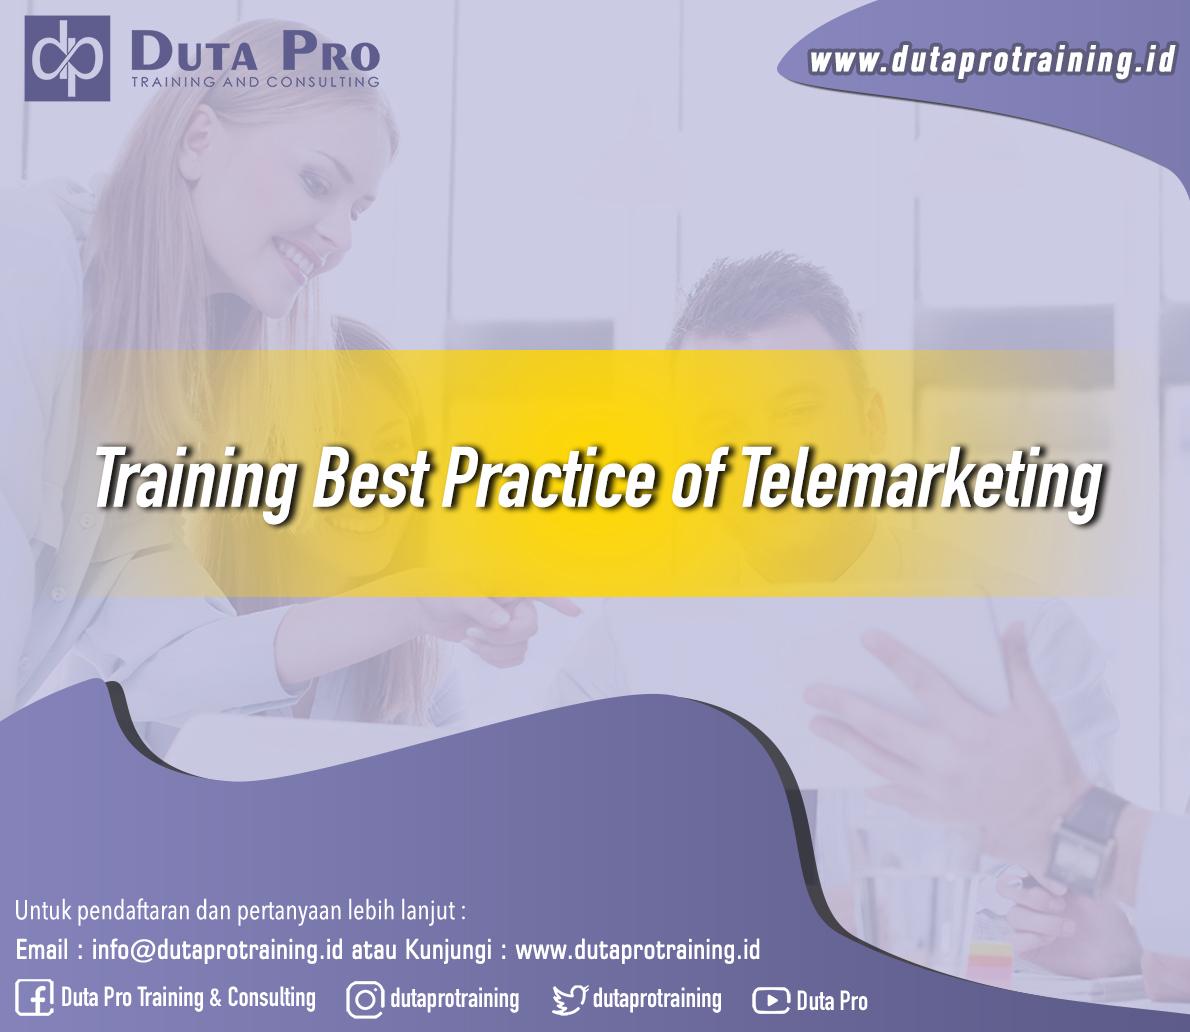 Training Best Practice of Telemarketing